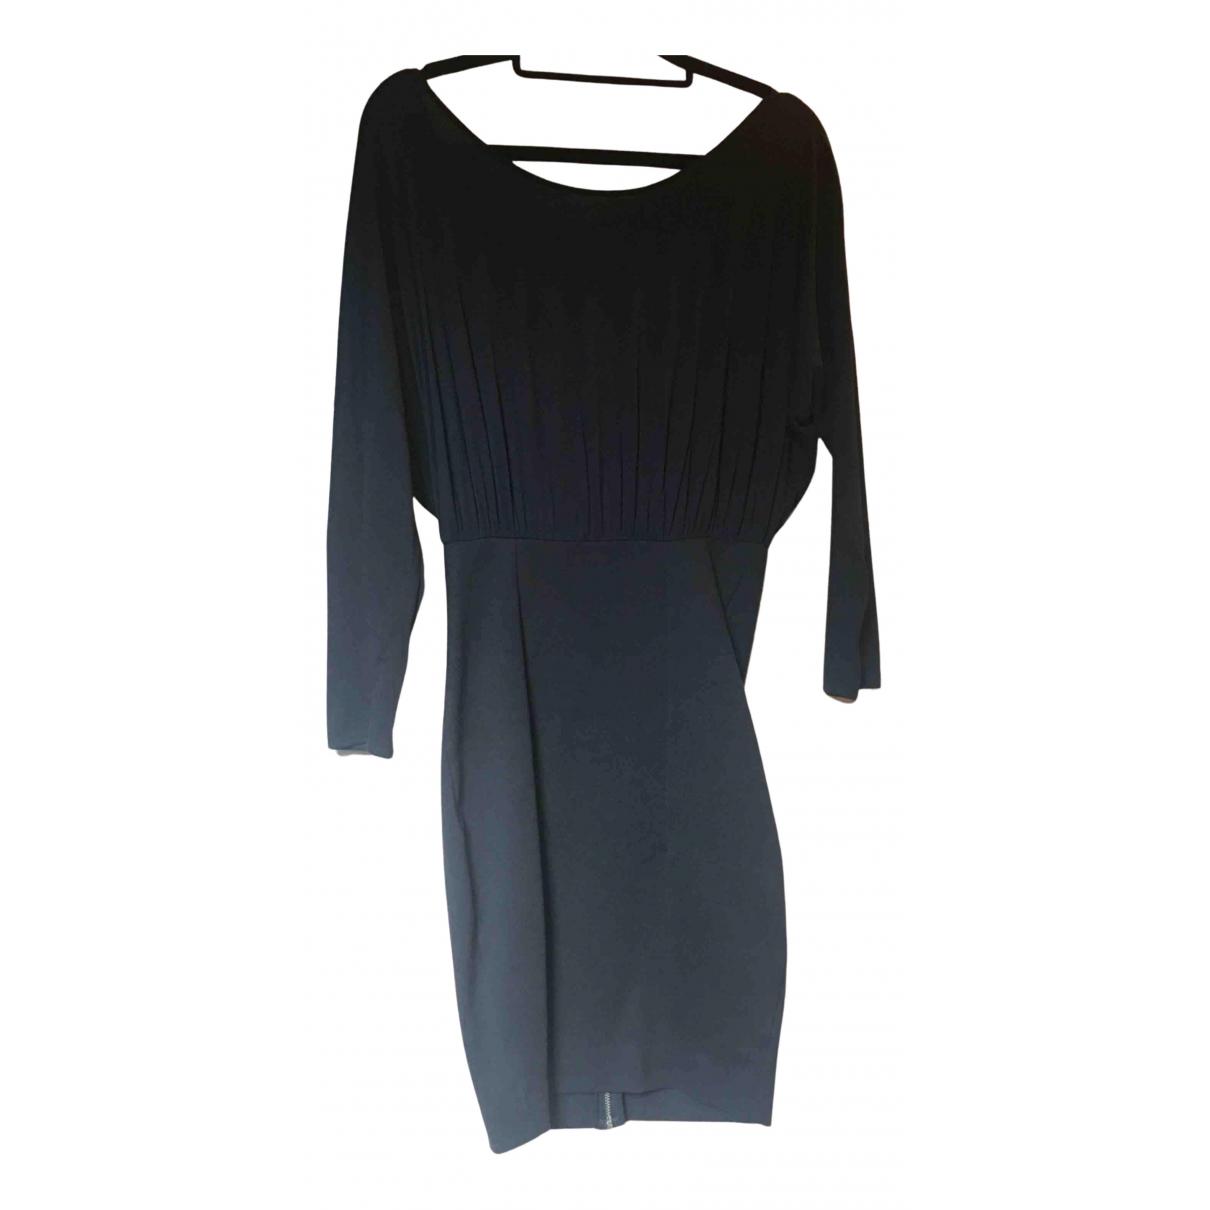 Cos N Blue dress for Women 8 UK